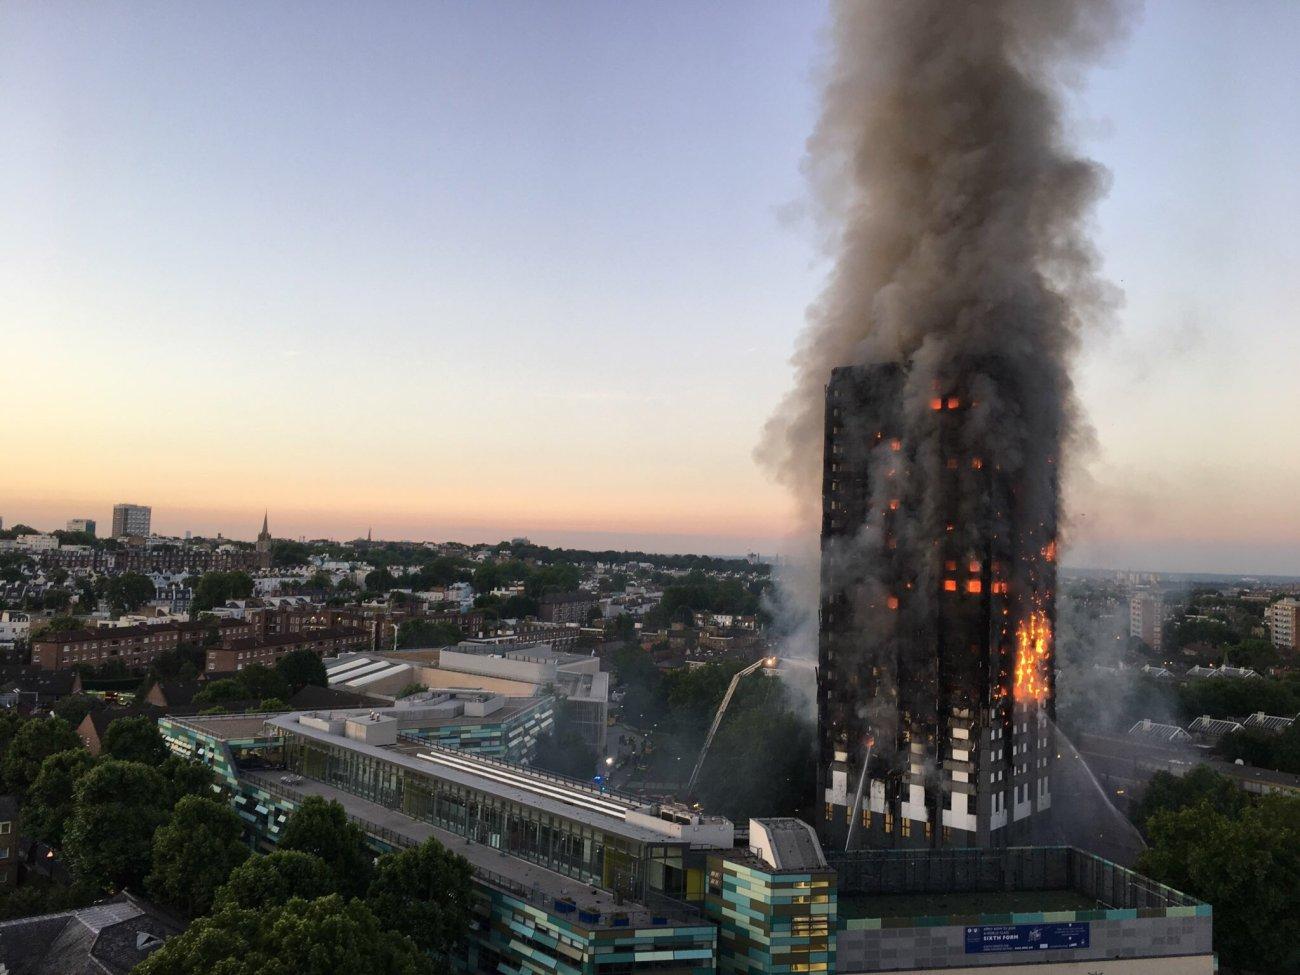 Torre Grenfell Londres en llamas